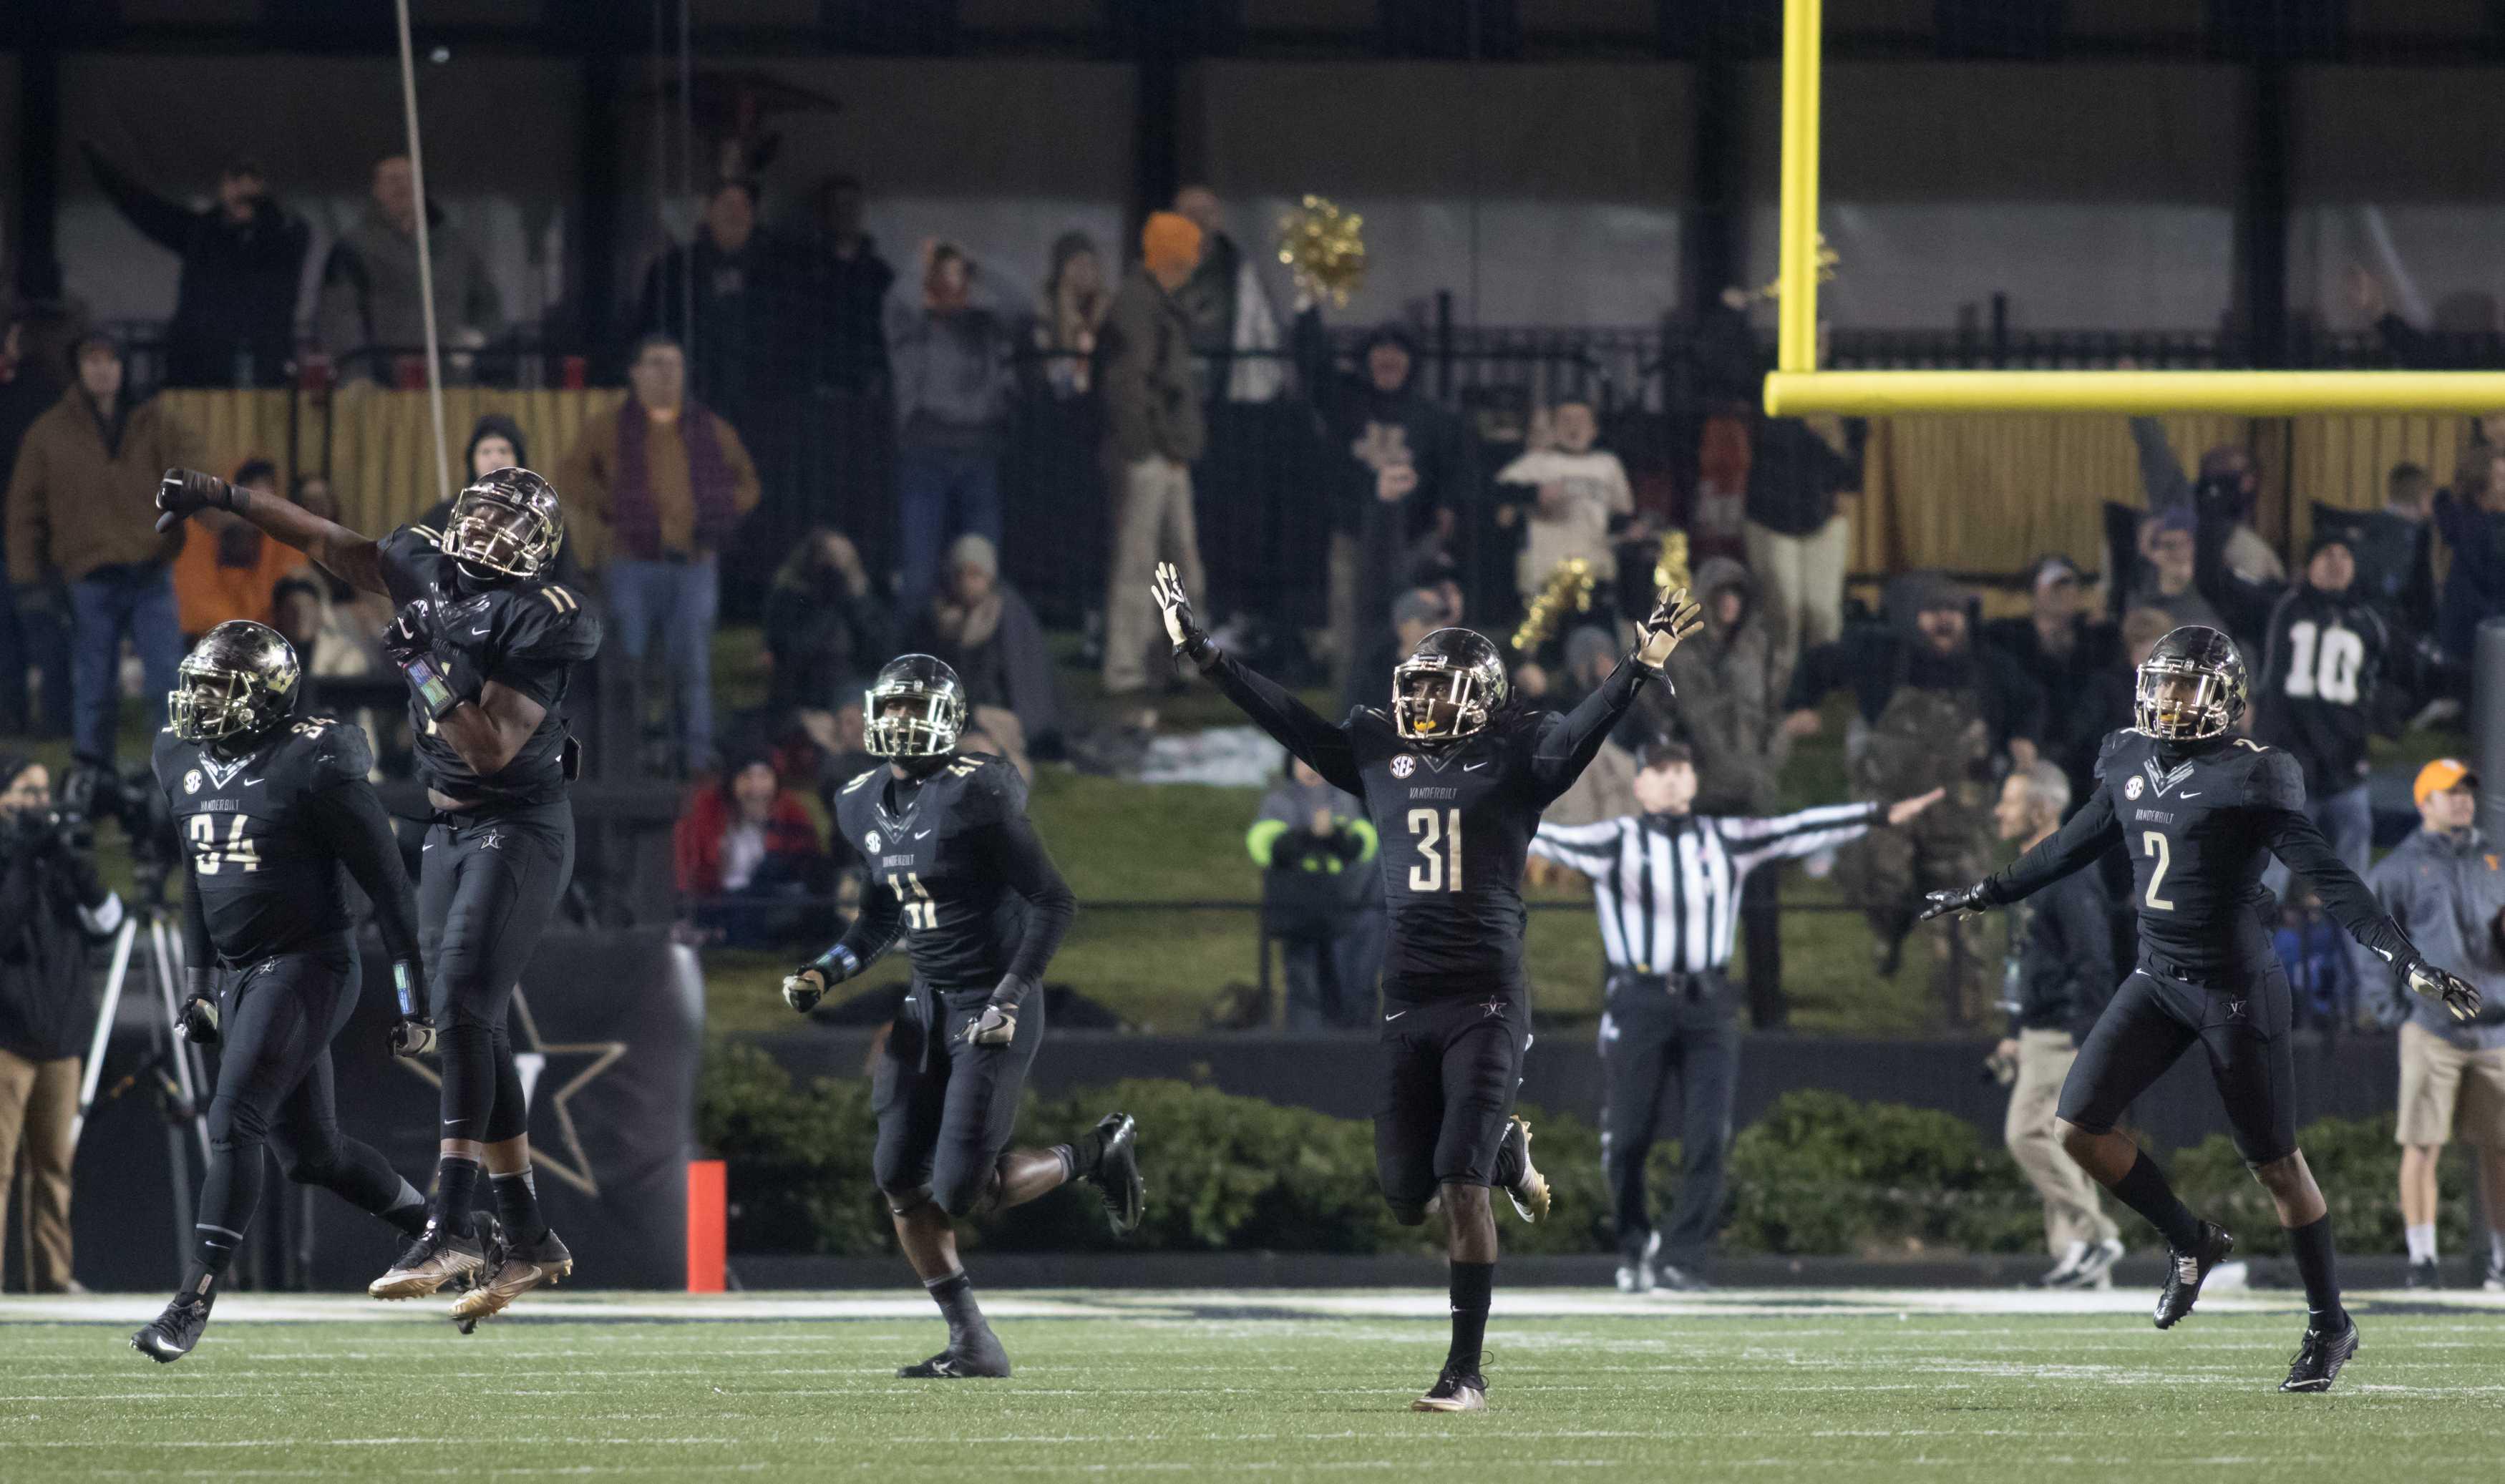 Tennessee missed field goal as Vanderbilt beat #17 Tennessee 45-34 at Vanderbilt Stadium November 26, 2016. Photo by Ziyi Liu.